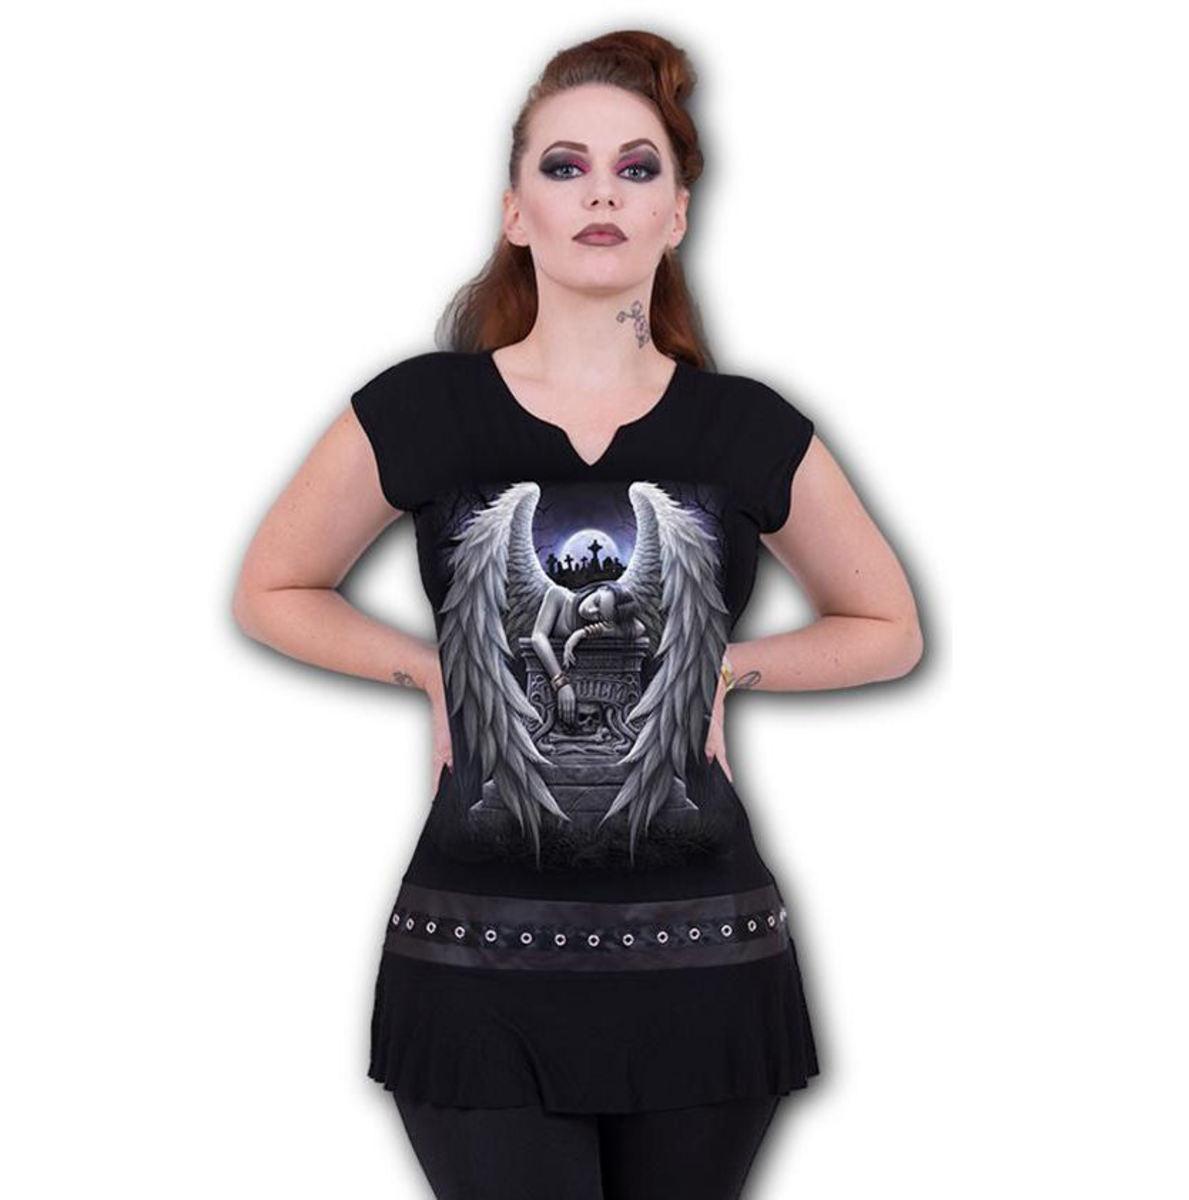 šaty dámske SPIRAL - INNER SORROW - Black - L048F108